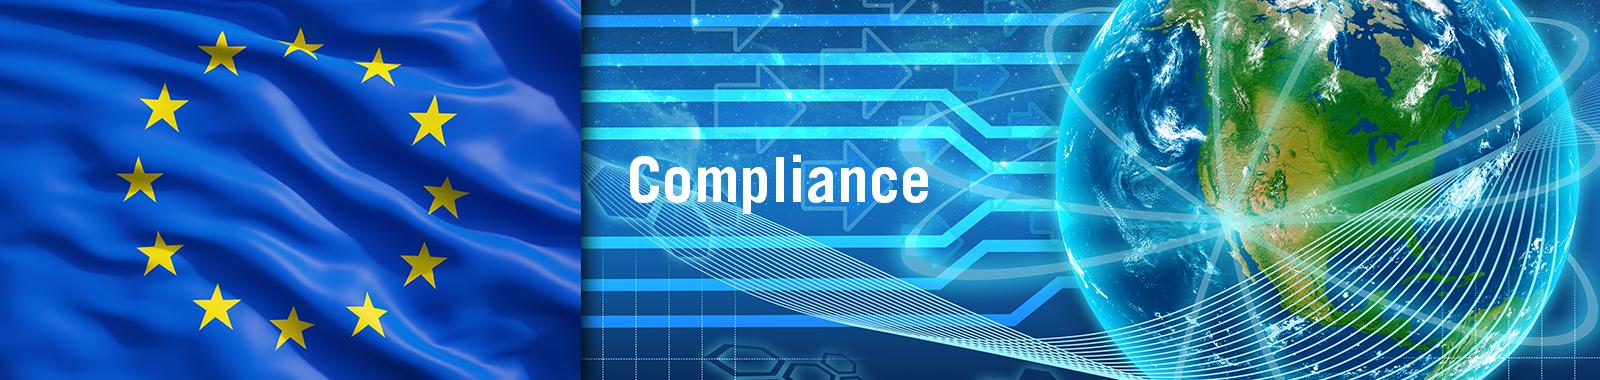 Global legal compliance EU